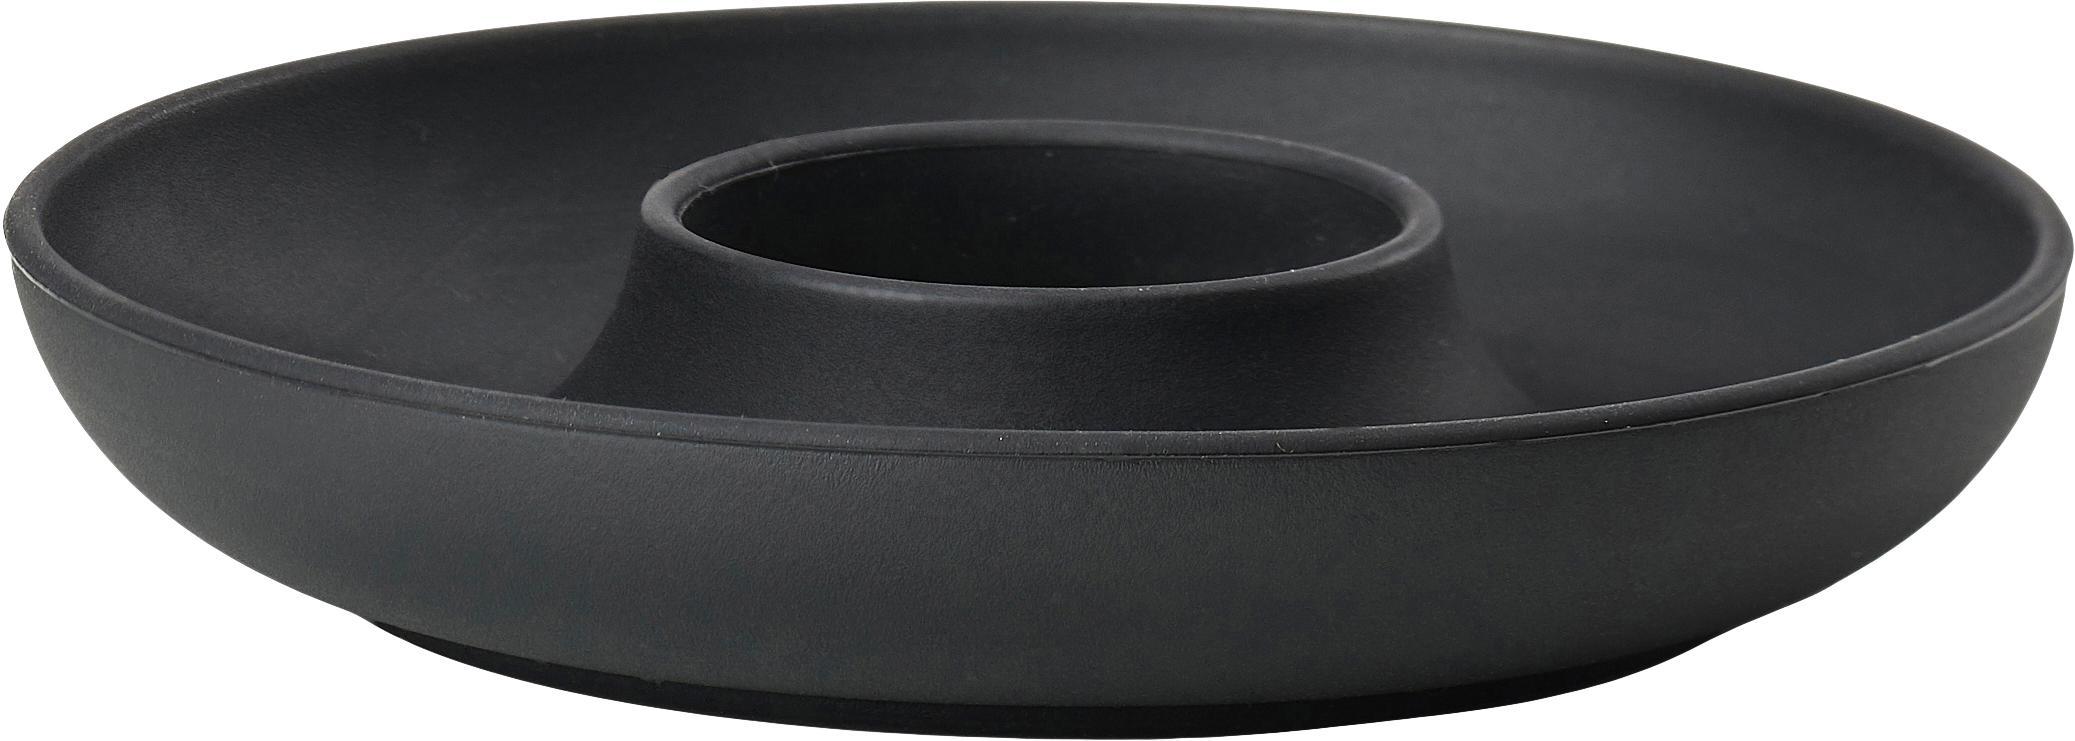 Kieliszek do jajek Henk, 4 szt., Silikon, metal powlekany, Czarny, Ø 11 cm